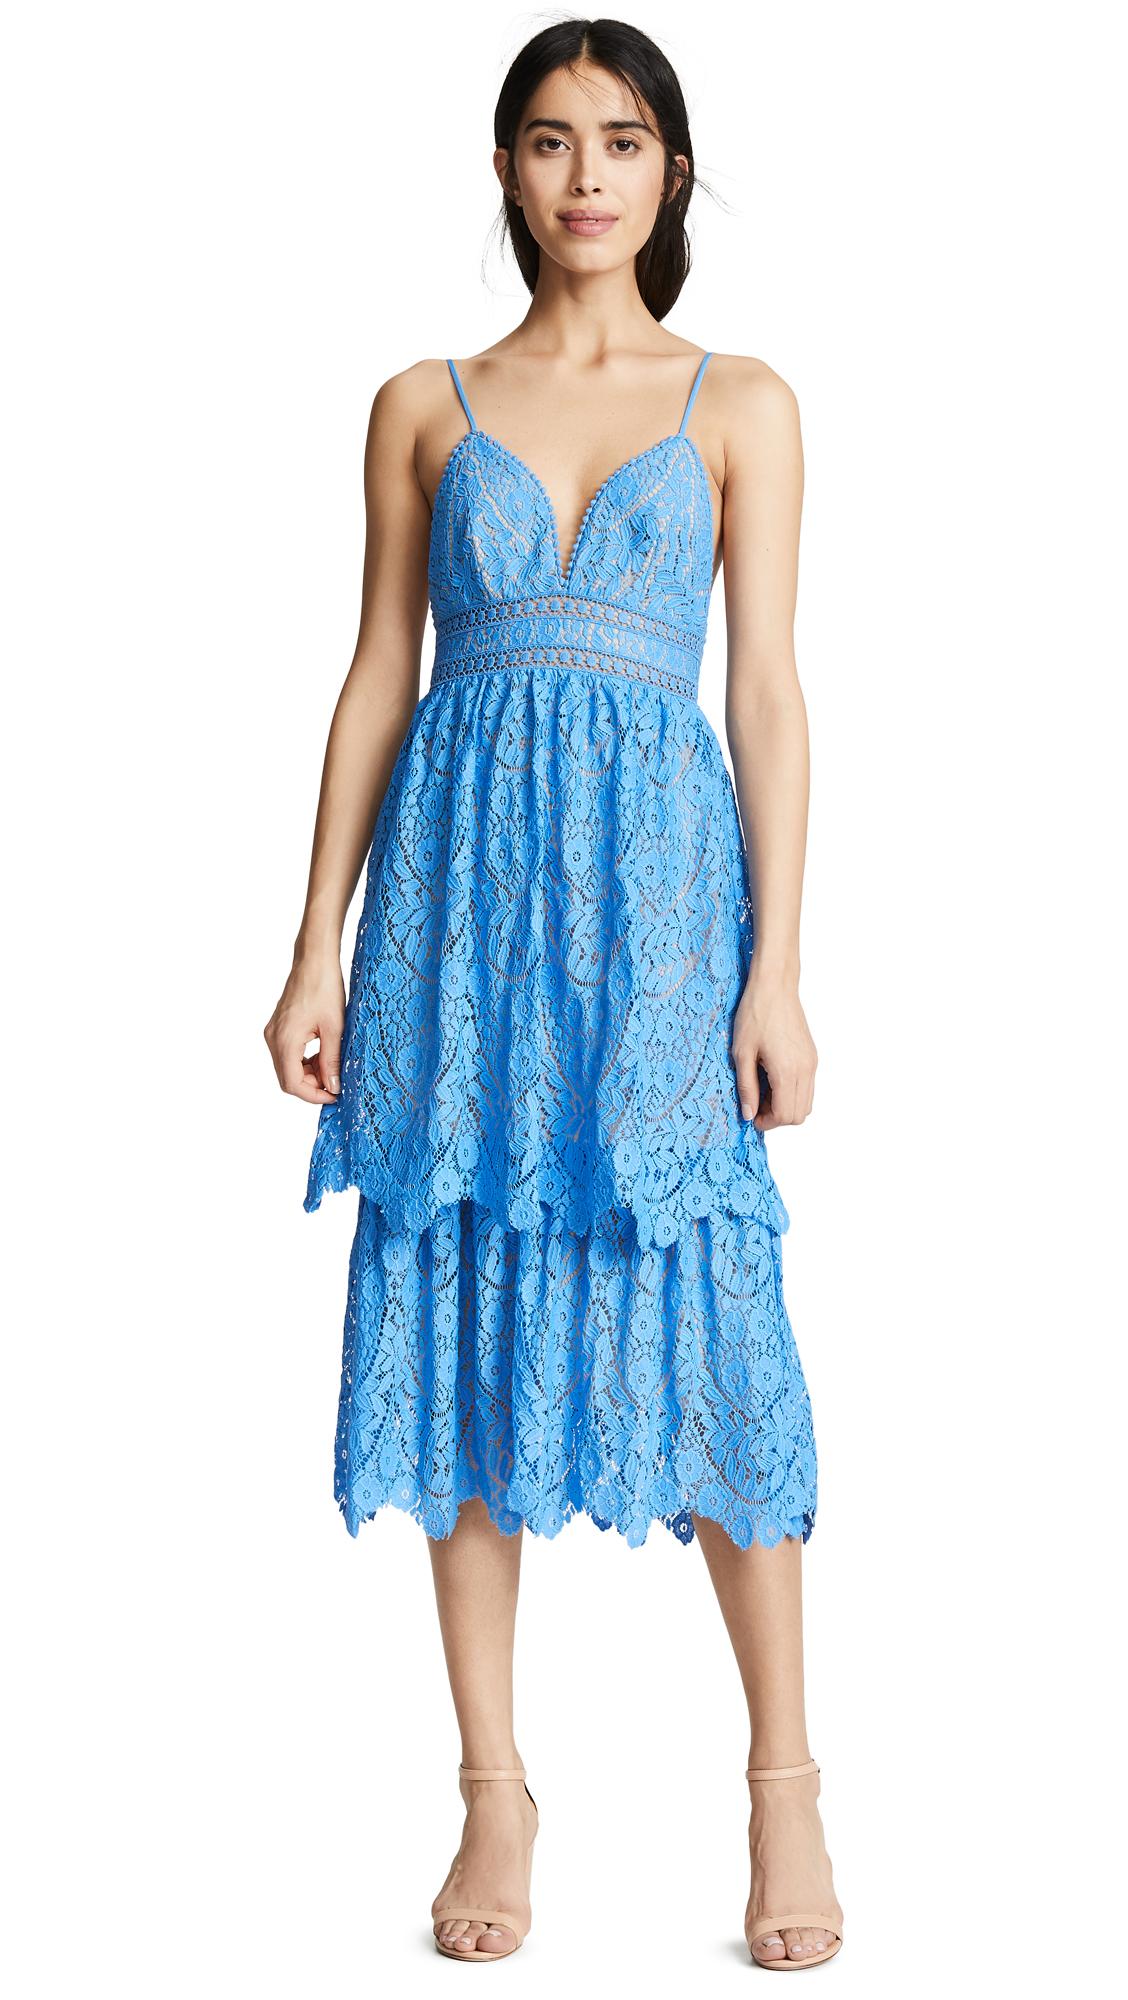 SAYLOR Safia Dress in Blue